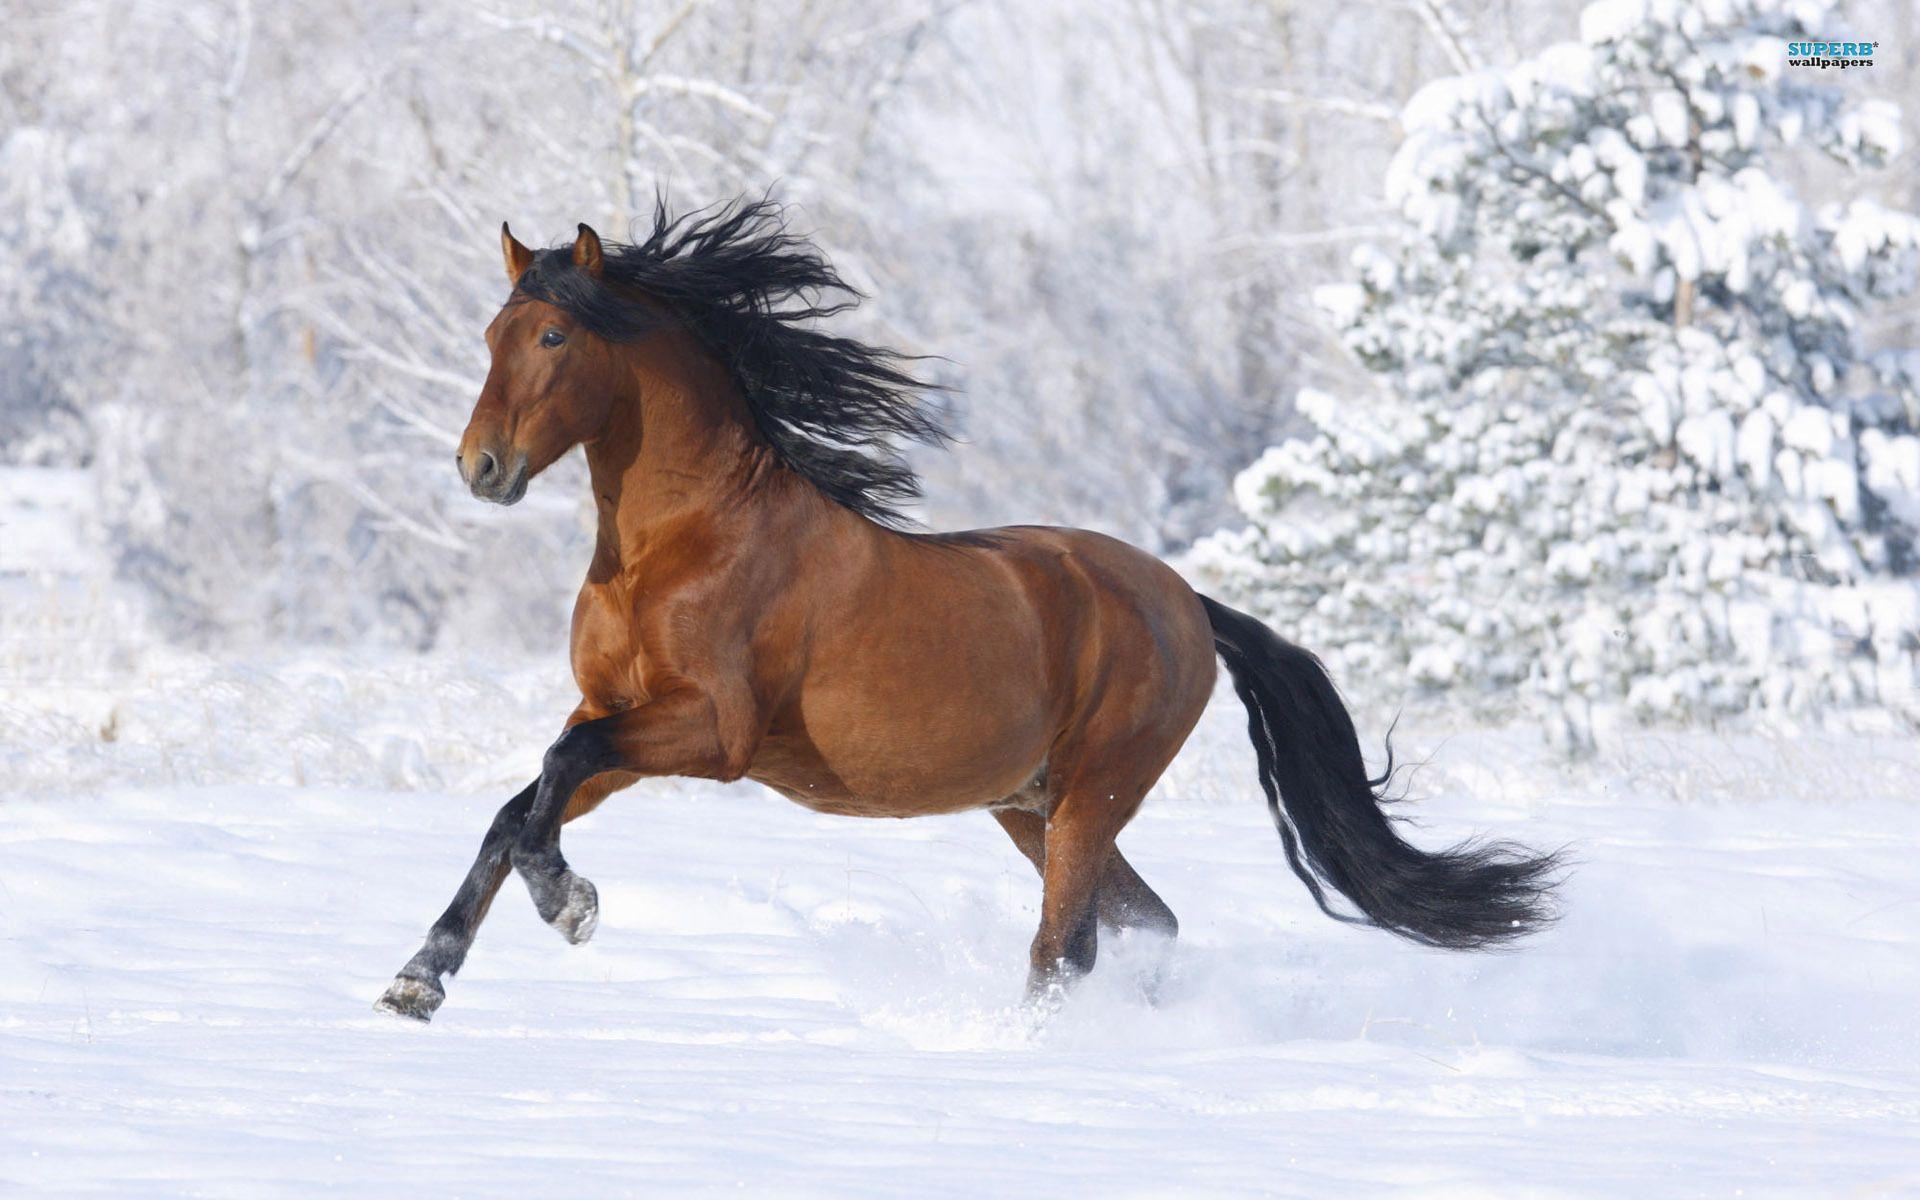 Best Wallpaper Horse Snow - ecf719f6362e3200a132b8baf3929fc5  Pictures_569062.jpg